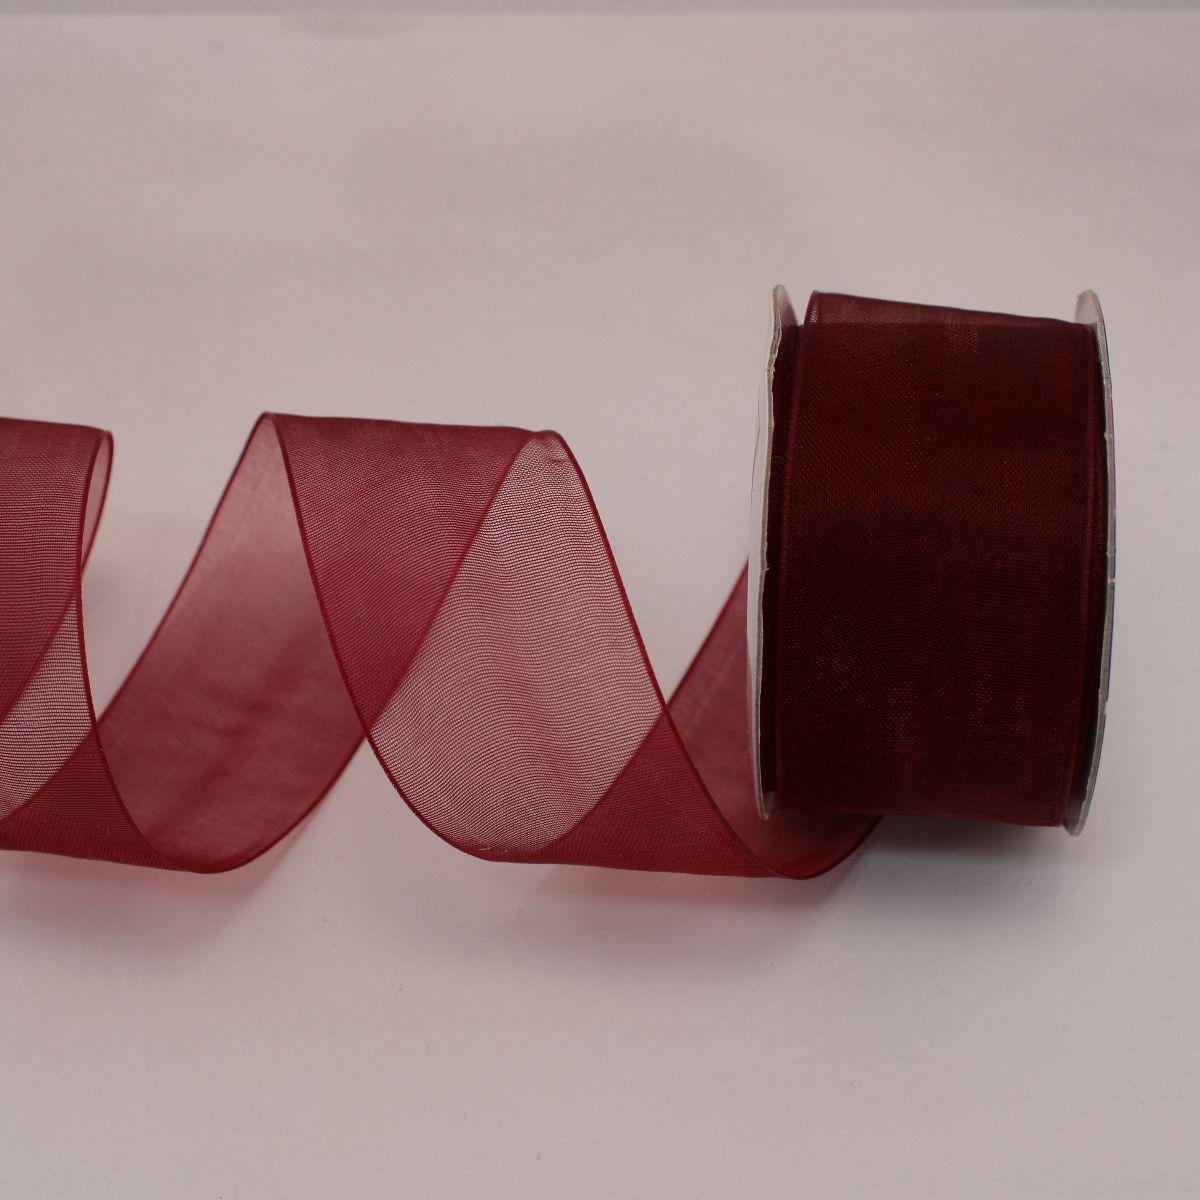 Ruban organdi en bobine bordeaux 32 mm